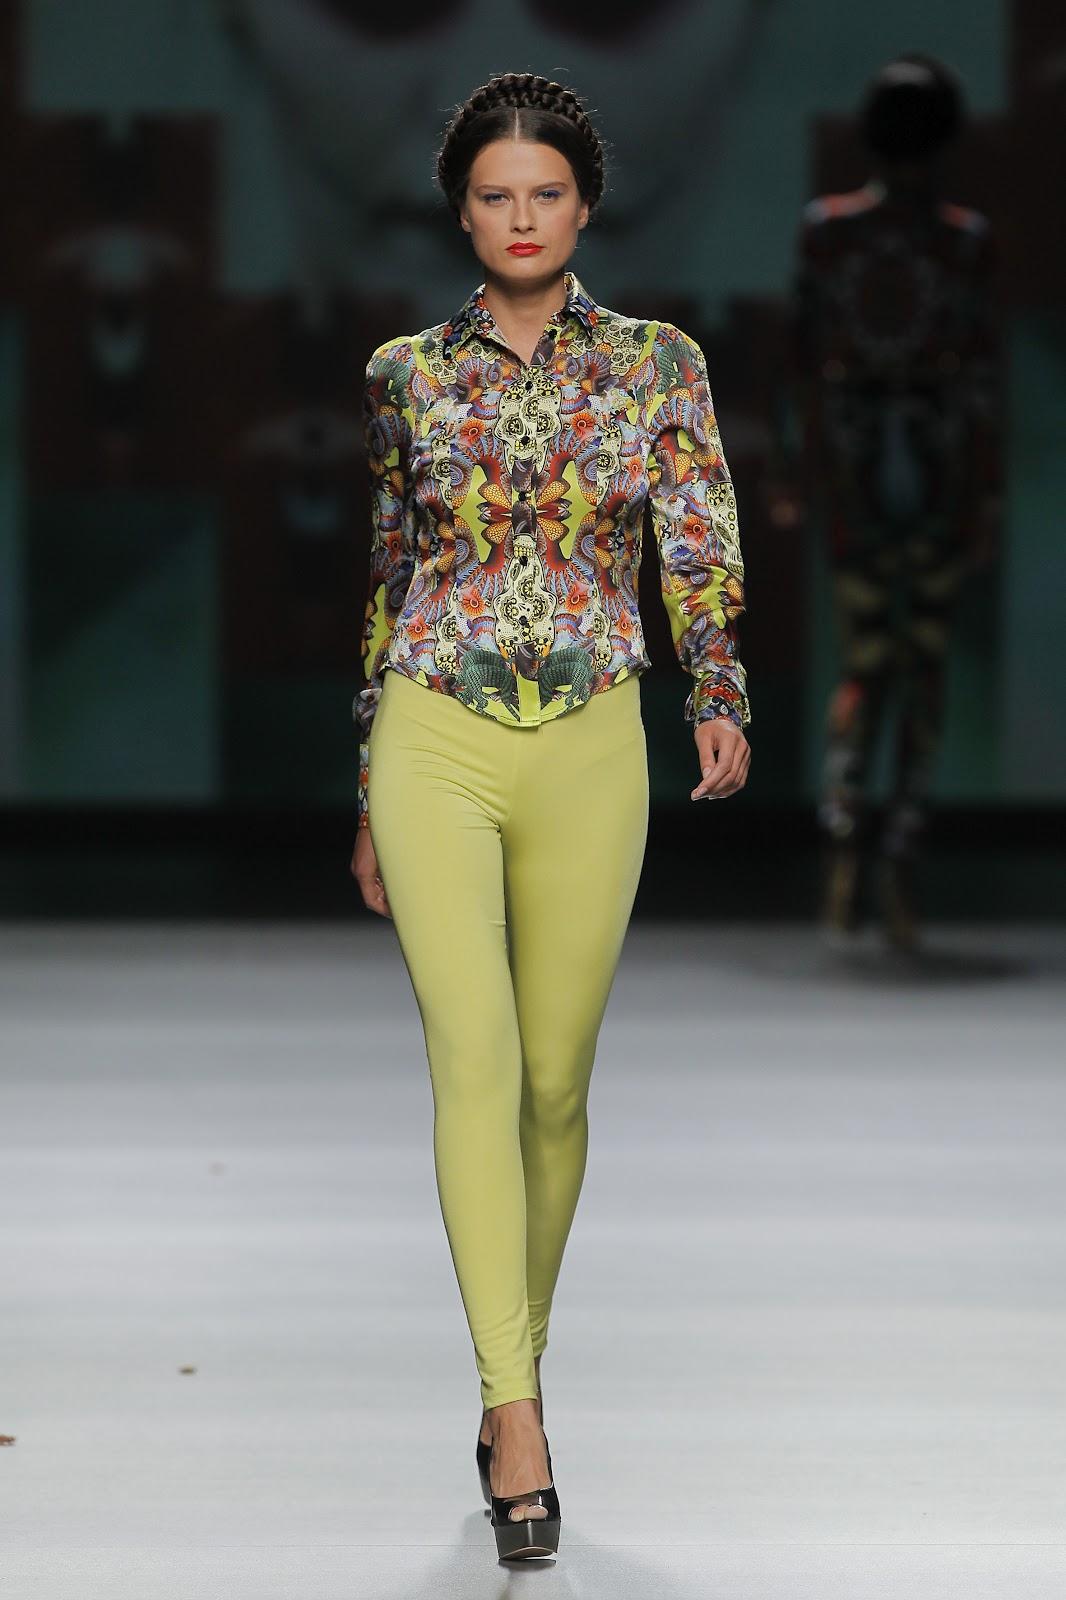 Fashion Studio Magazine: MAYA HANSEN SPRING/SUMMER 2013